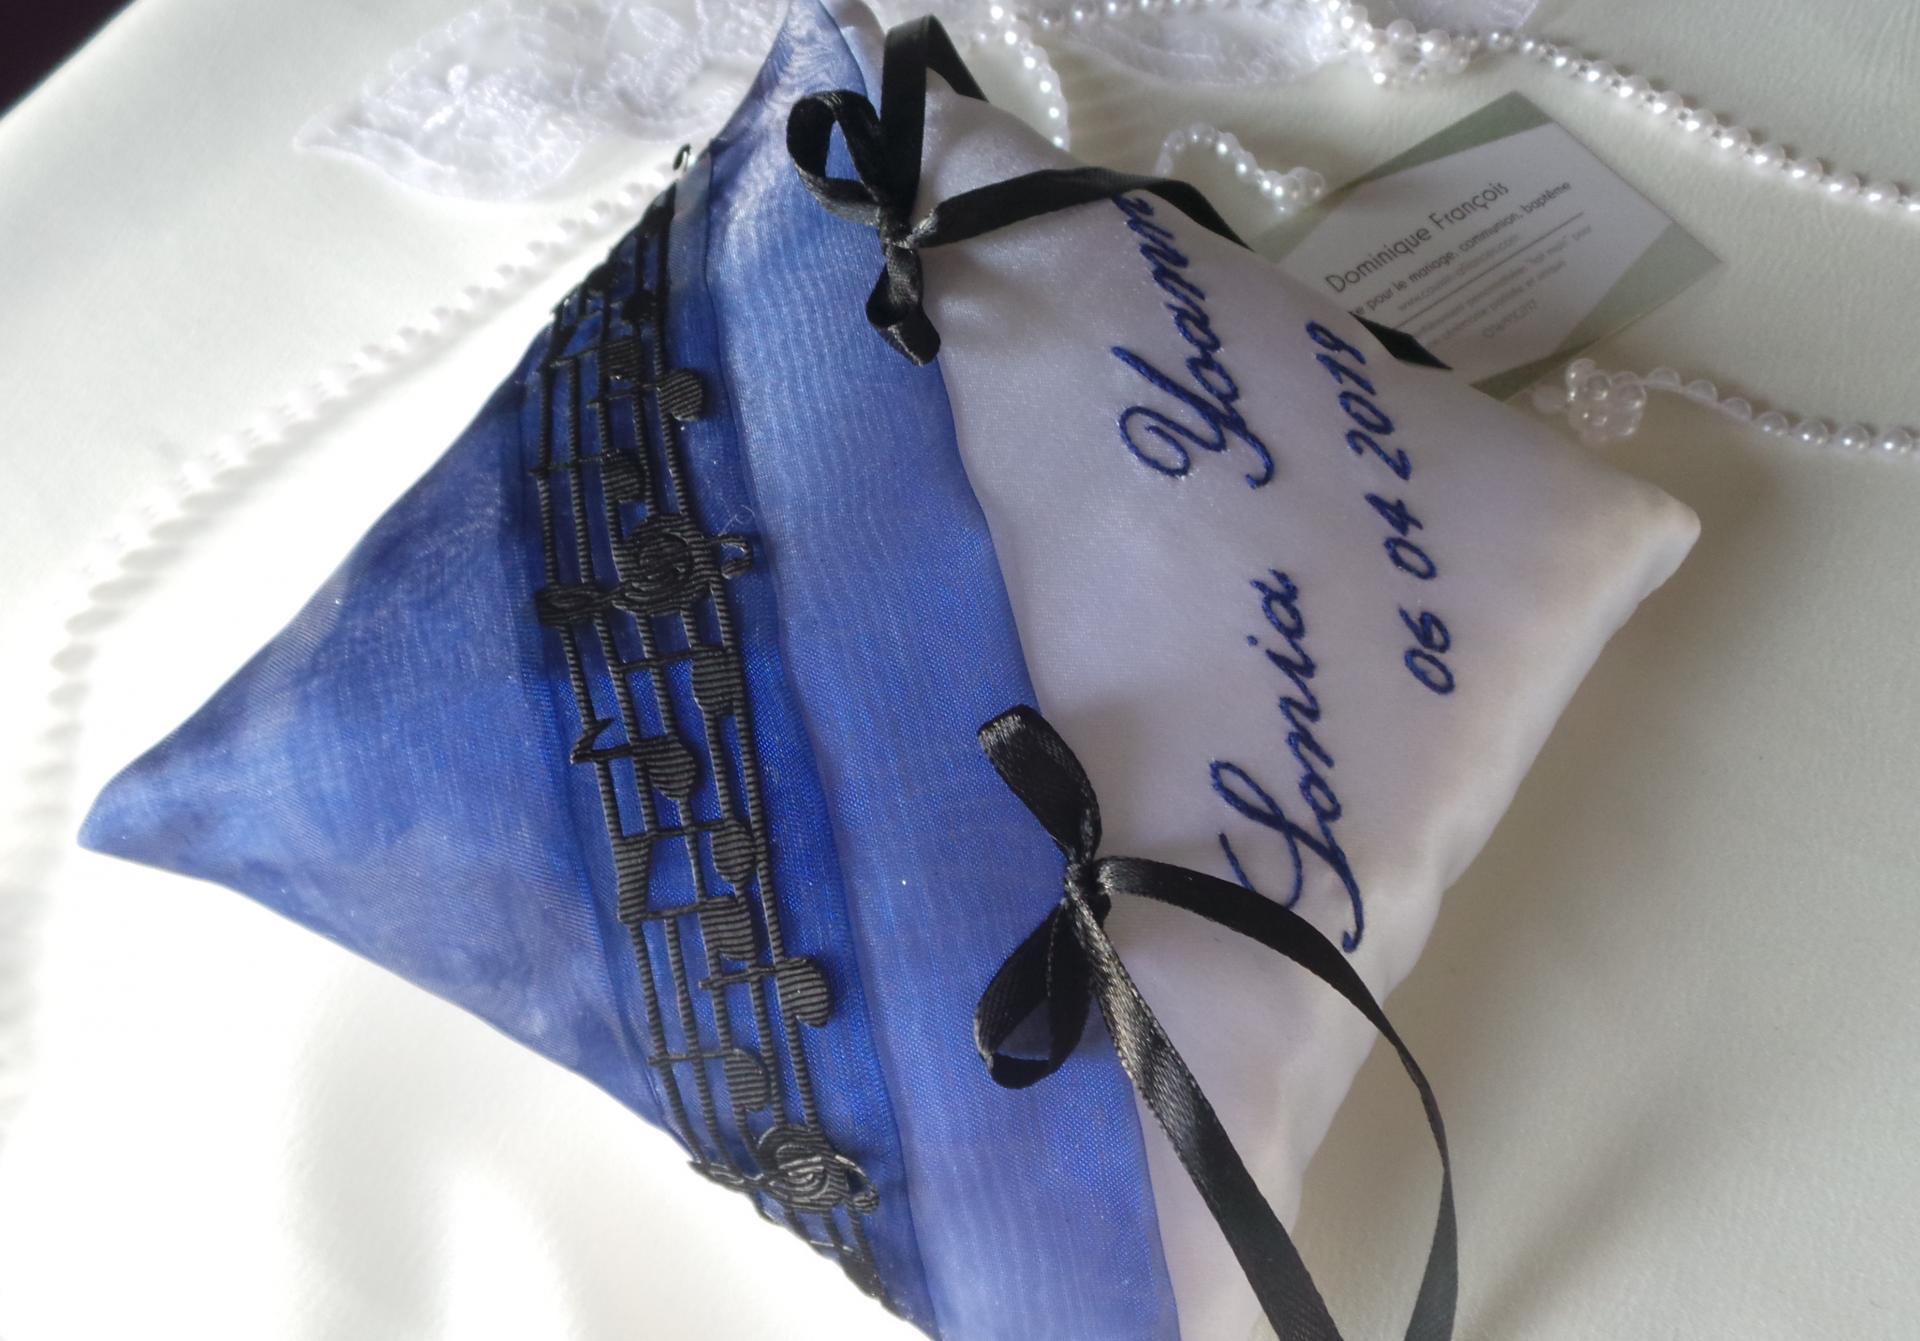 Coussin mariage bleu roi blanc musique prenom entier